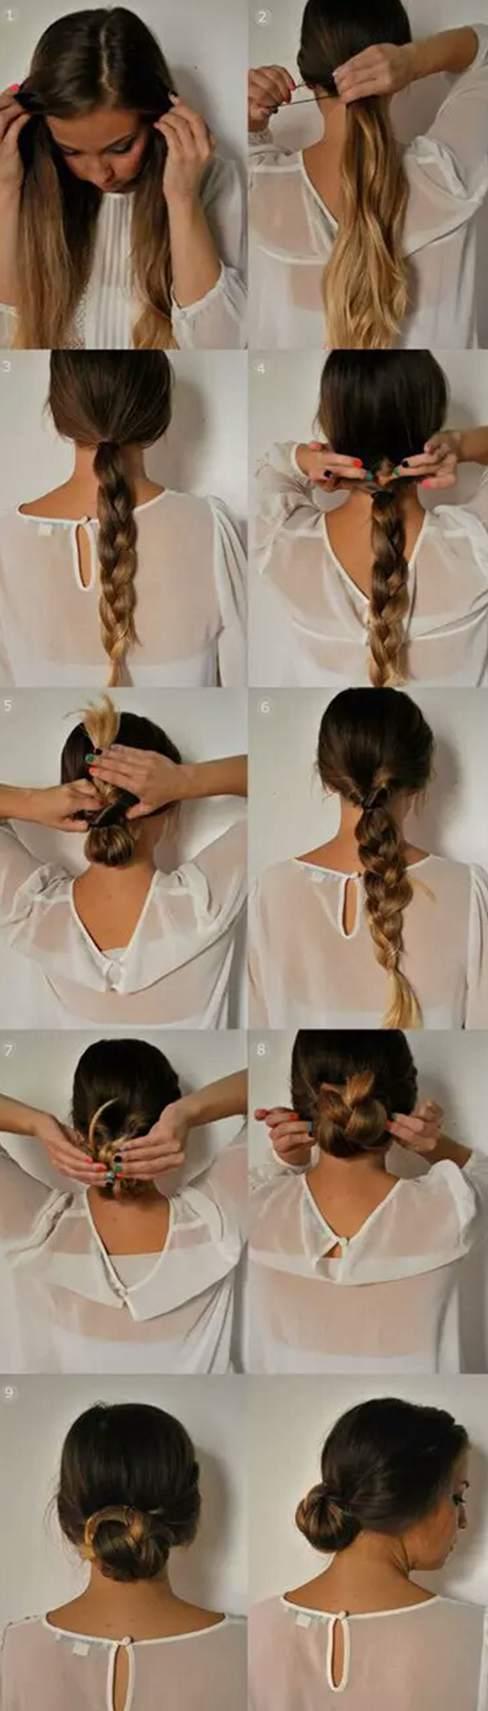 Long hair ideas easy minute hairstyles mornings long hair ideas